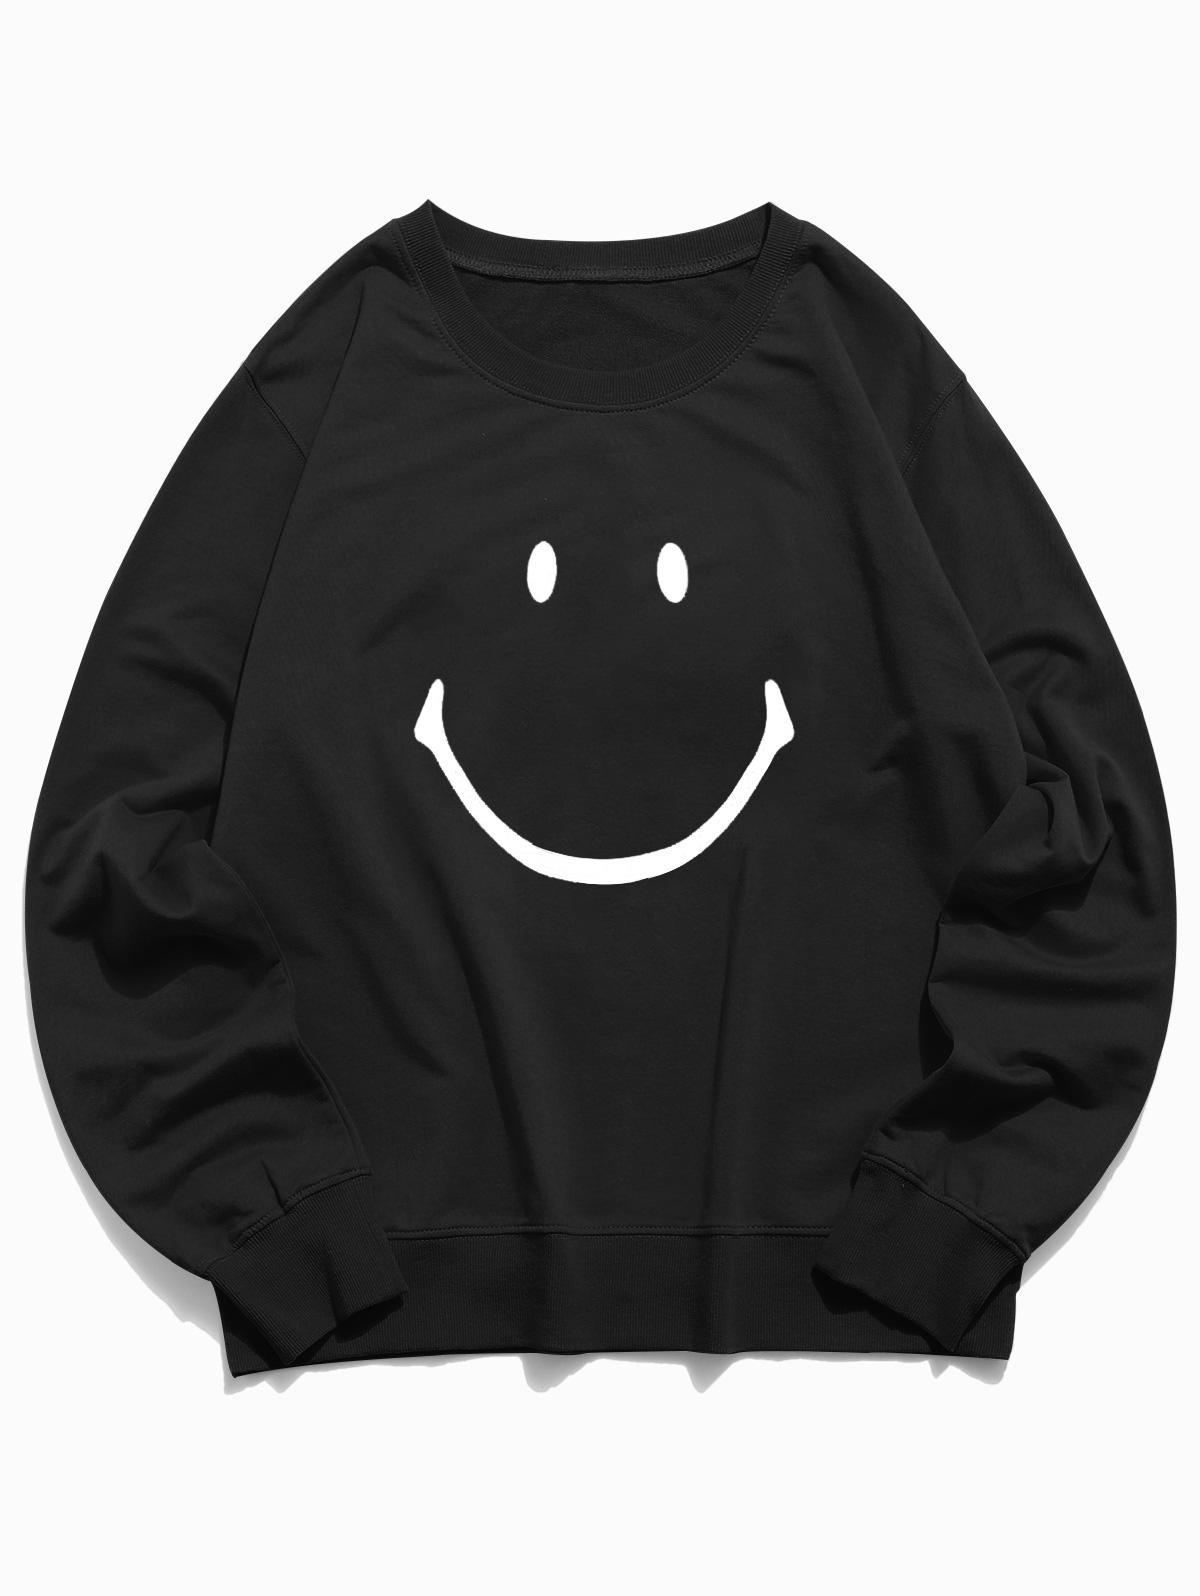 Lounge Smiley Face Graphic Crew Neck Sweatshirt, Black